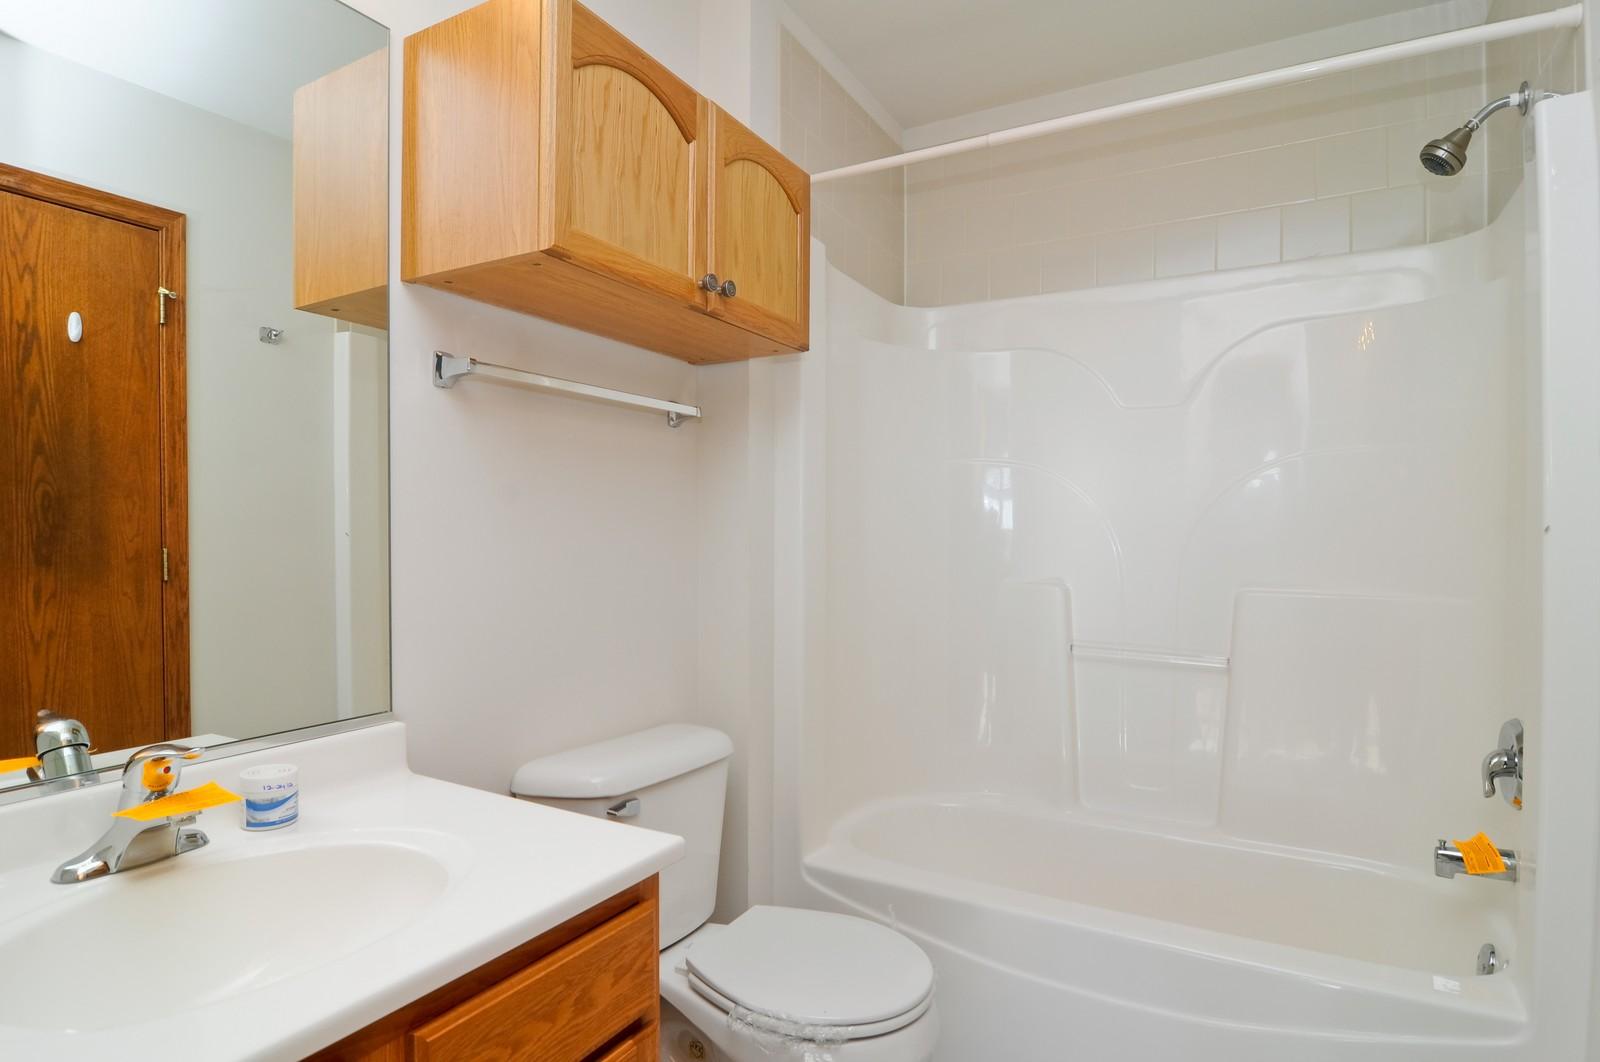 Real Estate Photography - 346 Terra Cir, Fox Lake, IL, 60020 - Bathroom